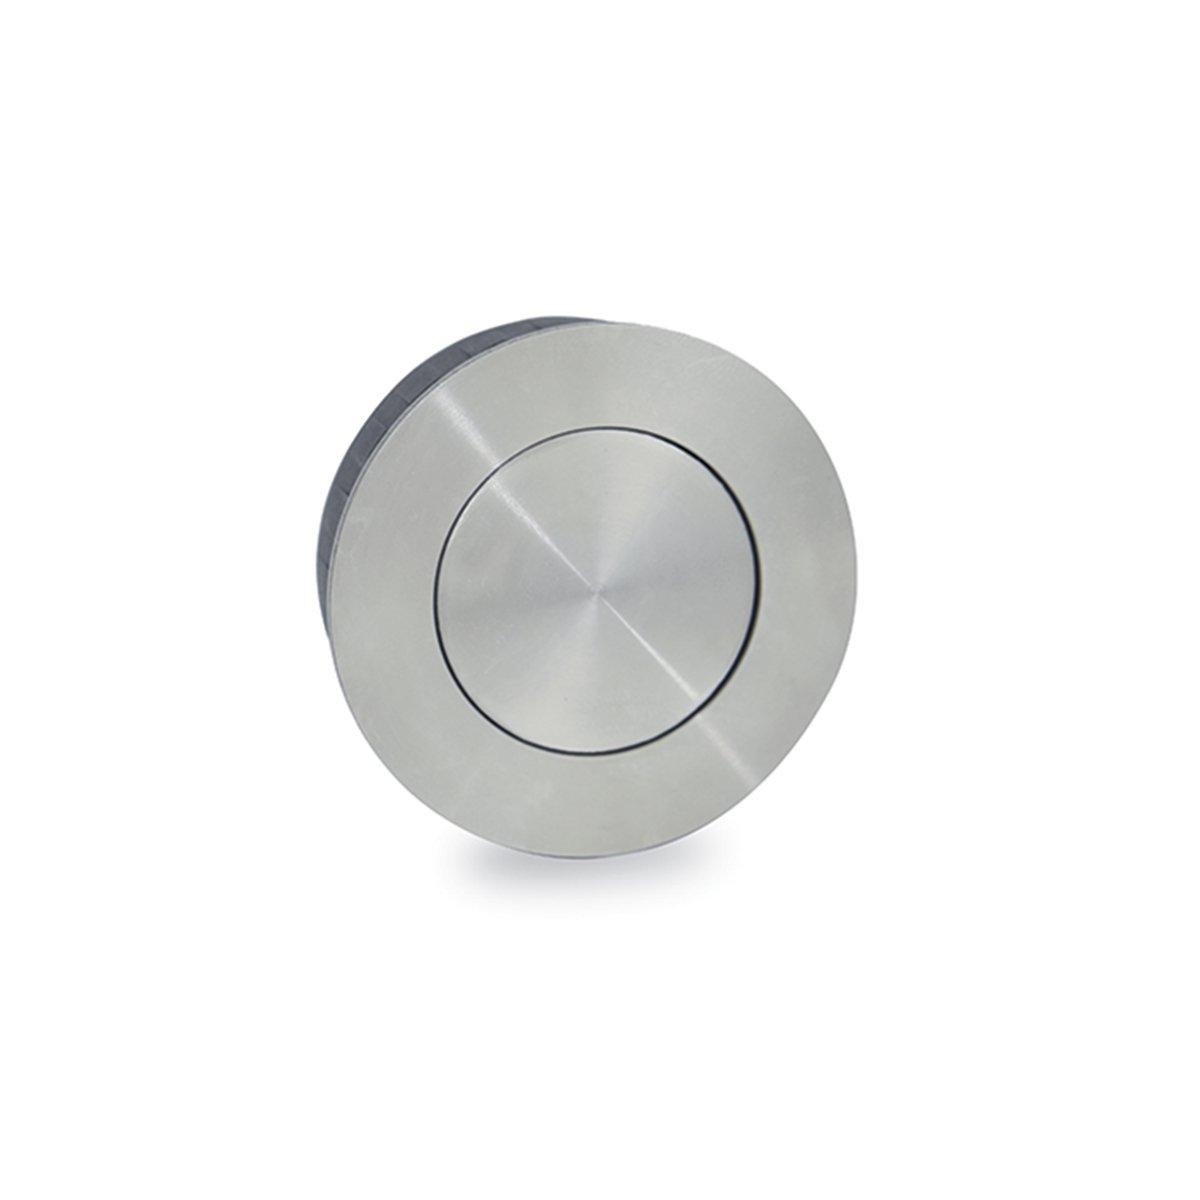 Jako WFH110X50 Round Flush Pull - Stainless Steel, Diameter 2''